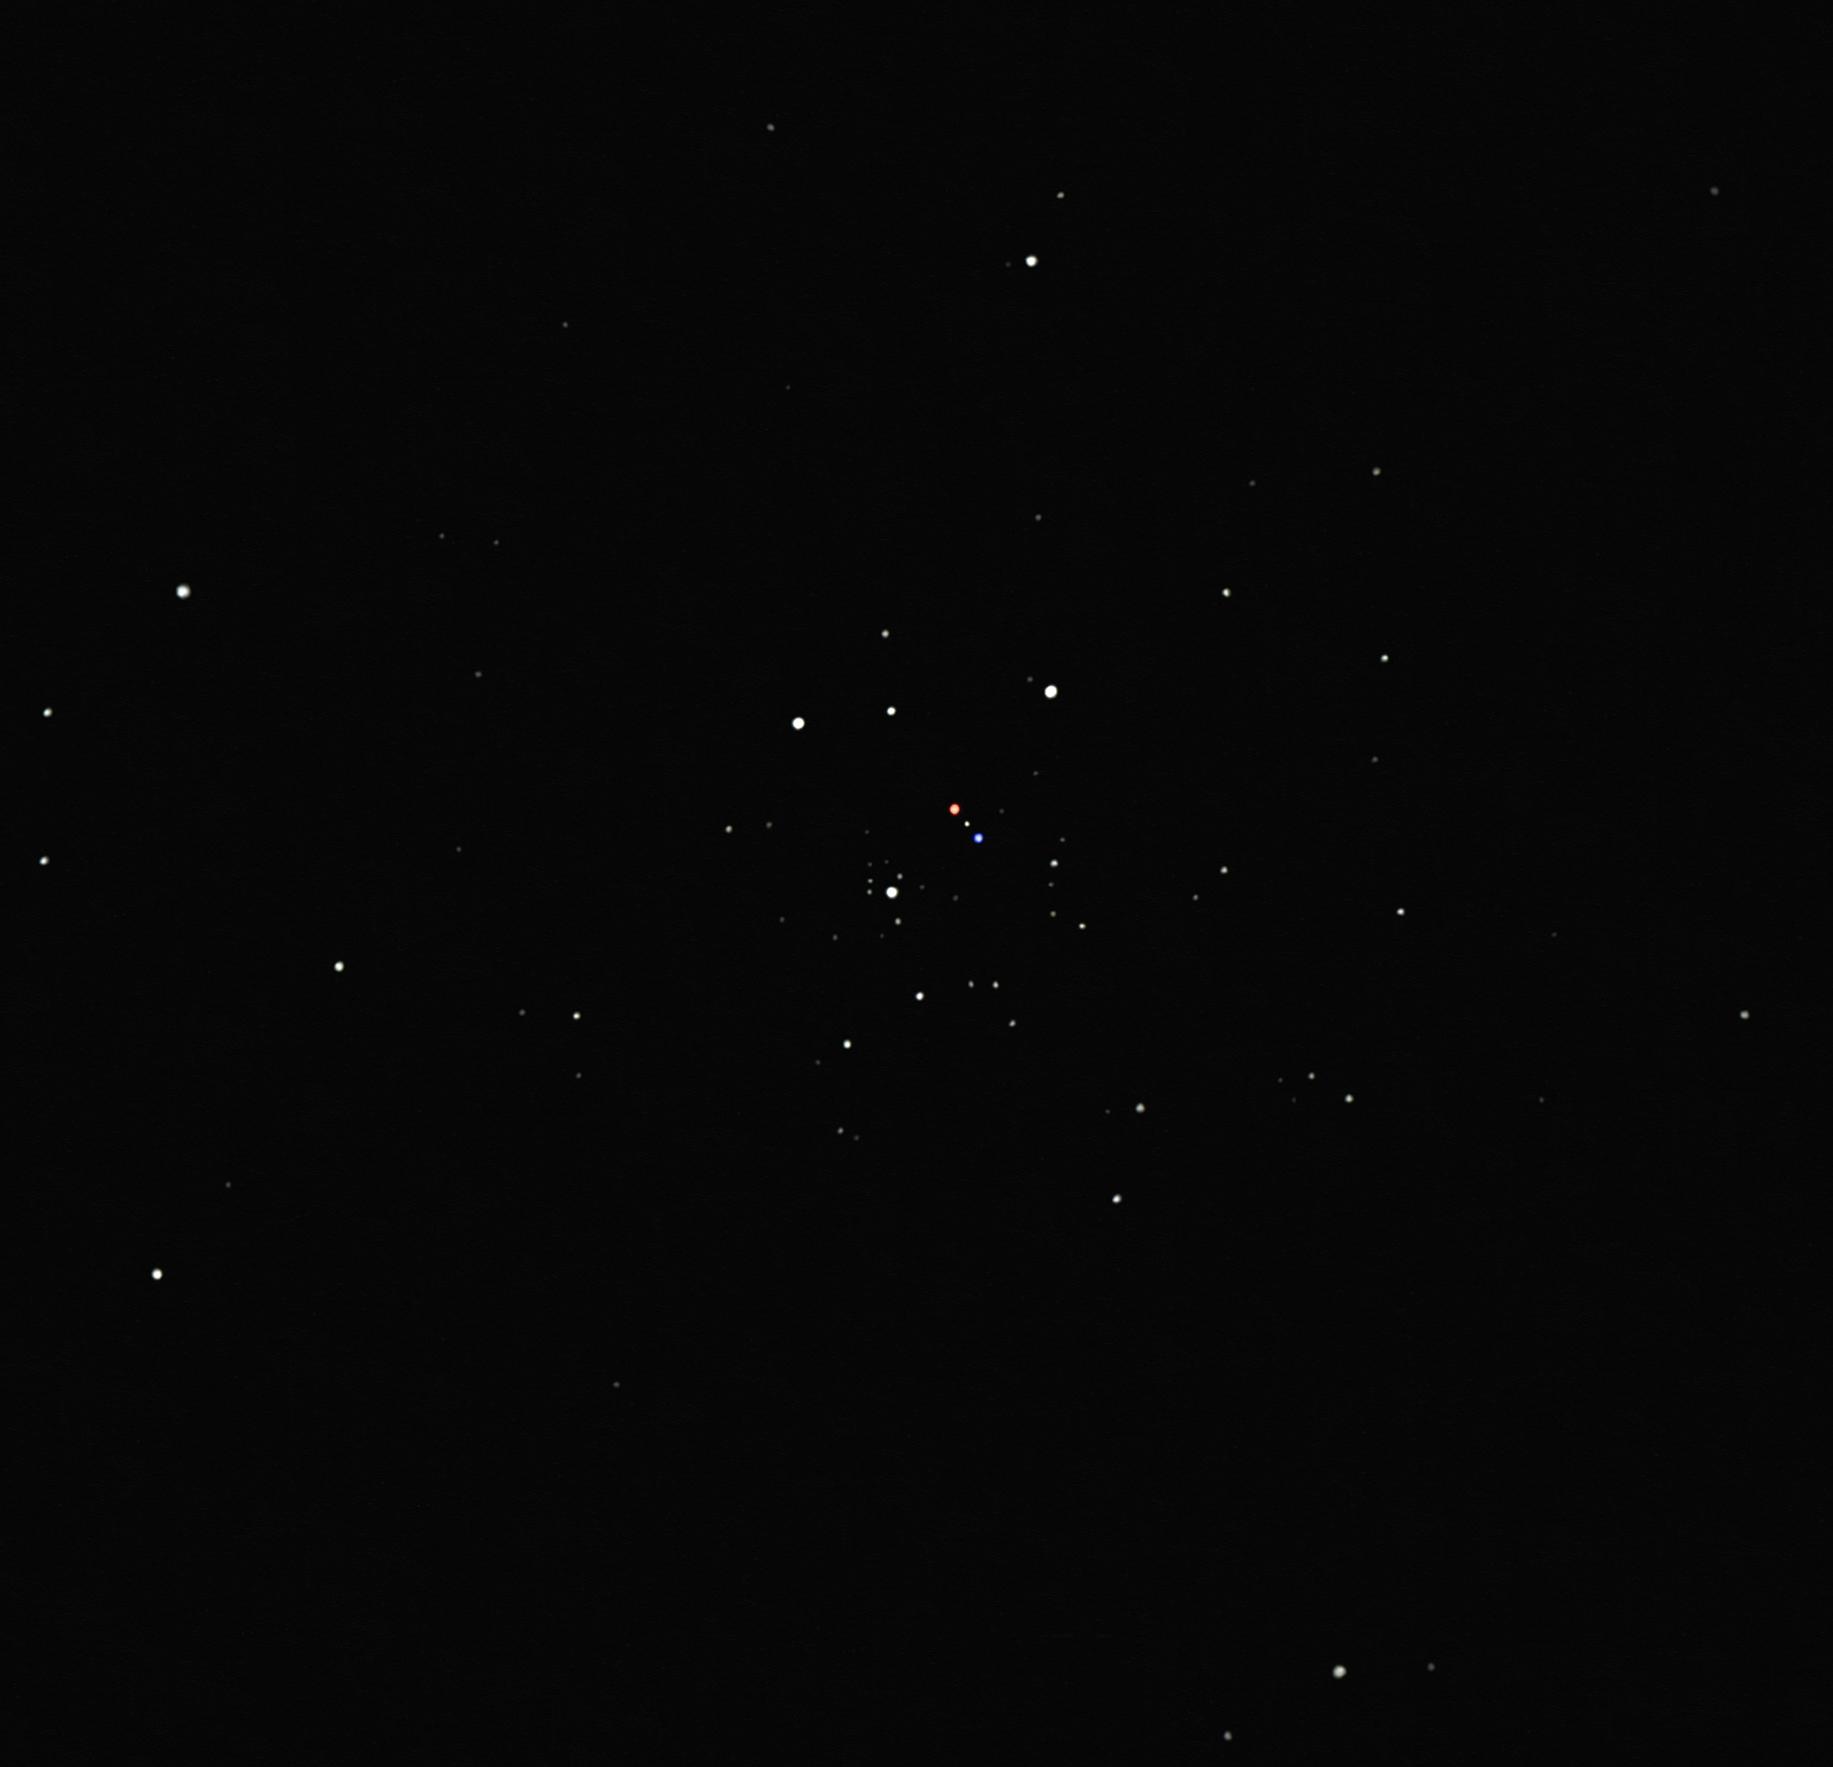 ngc 4755 open cluster